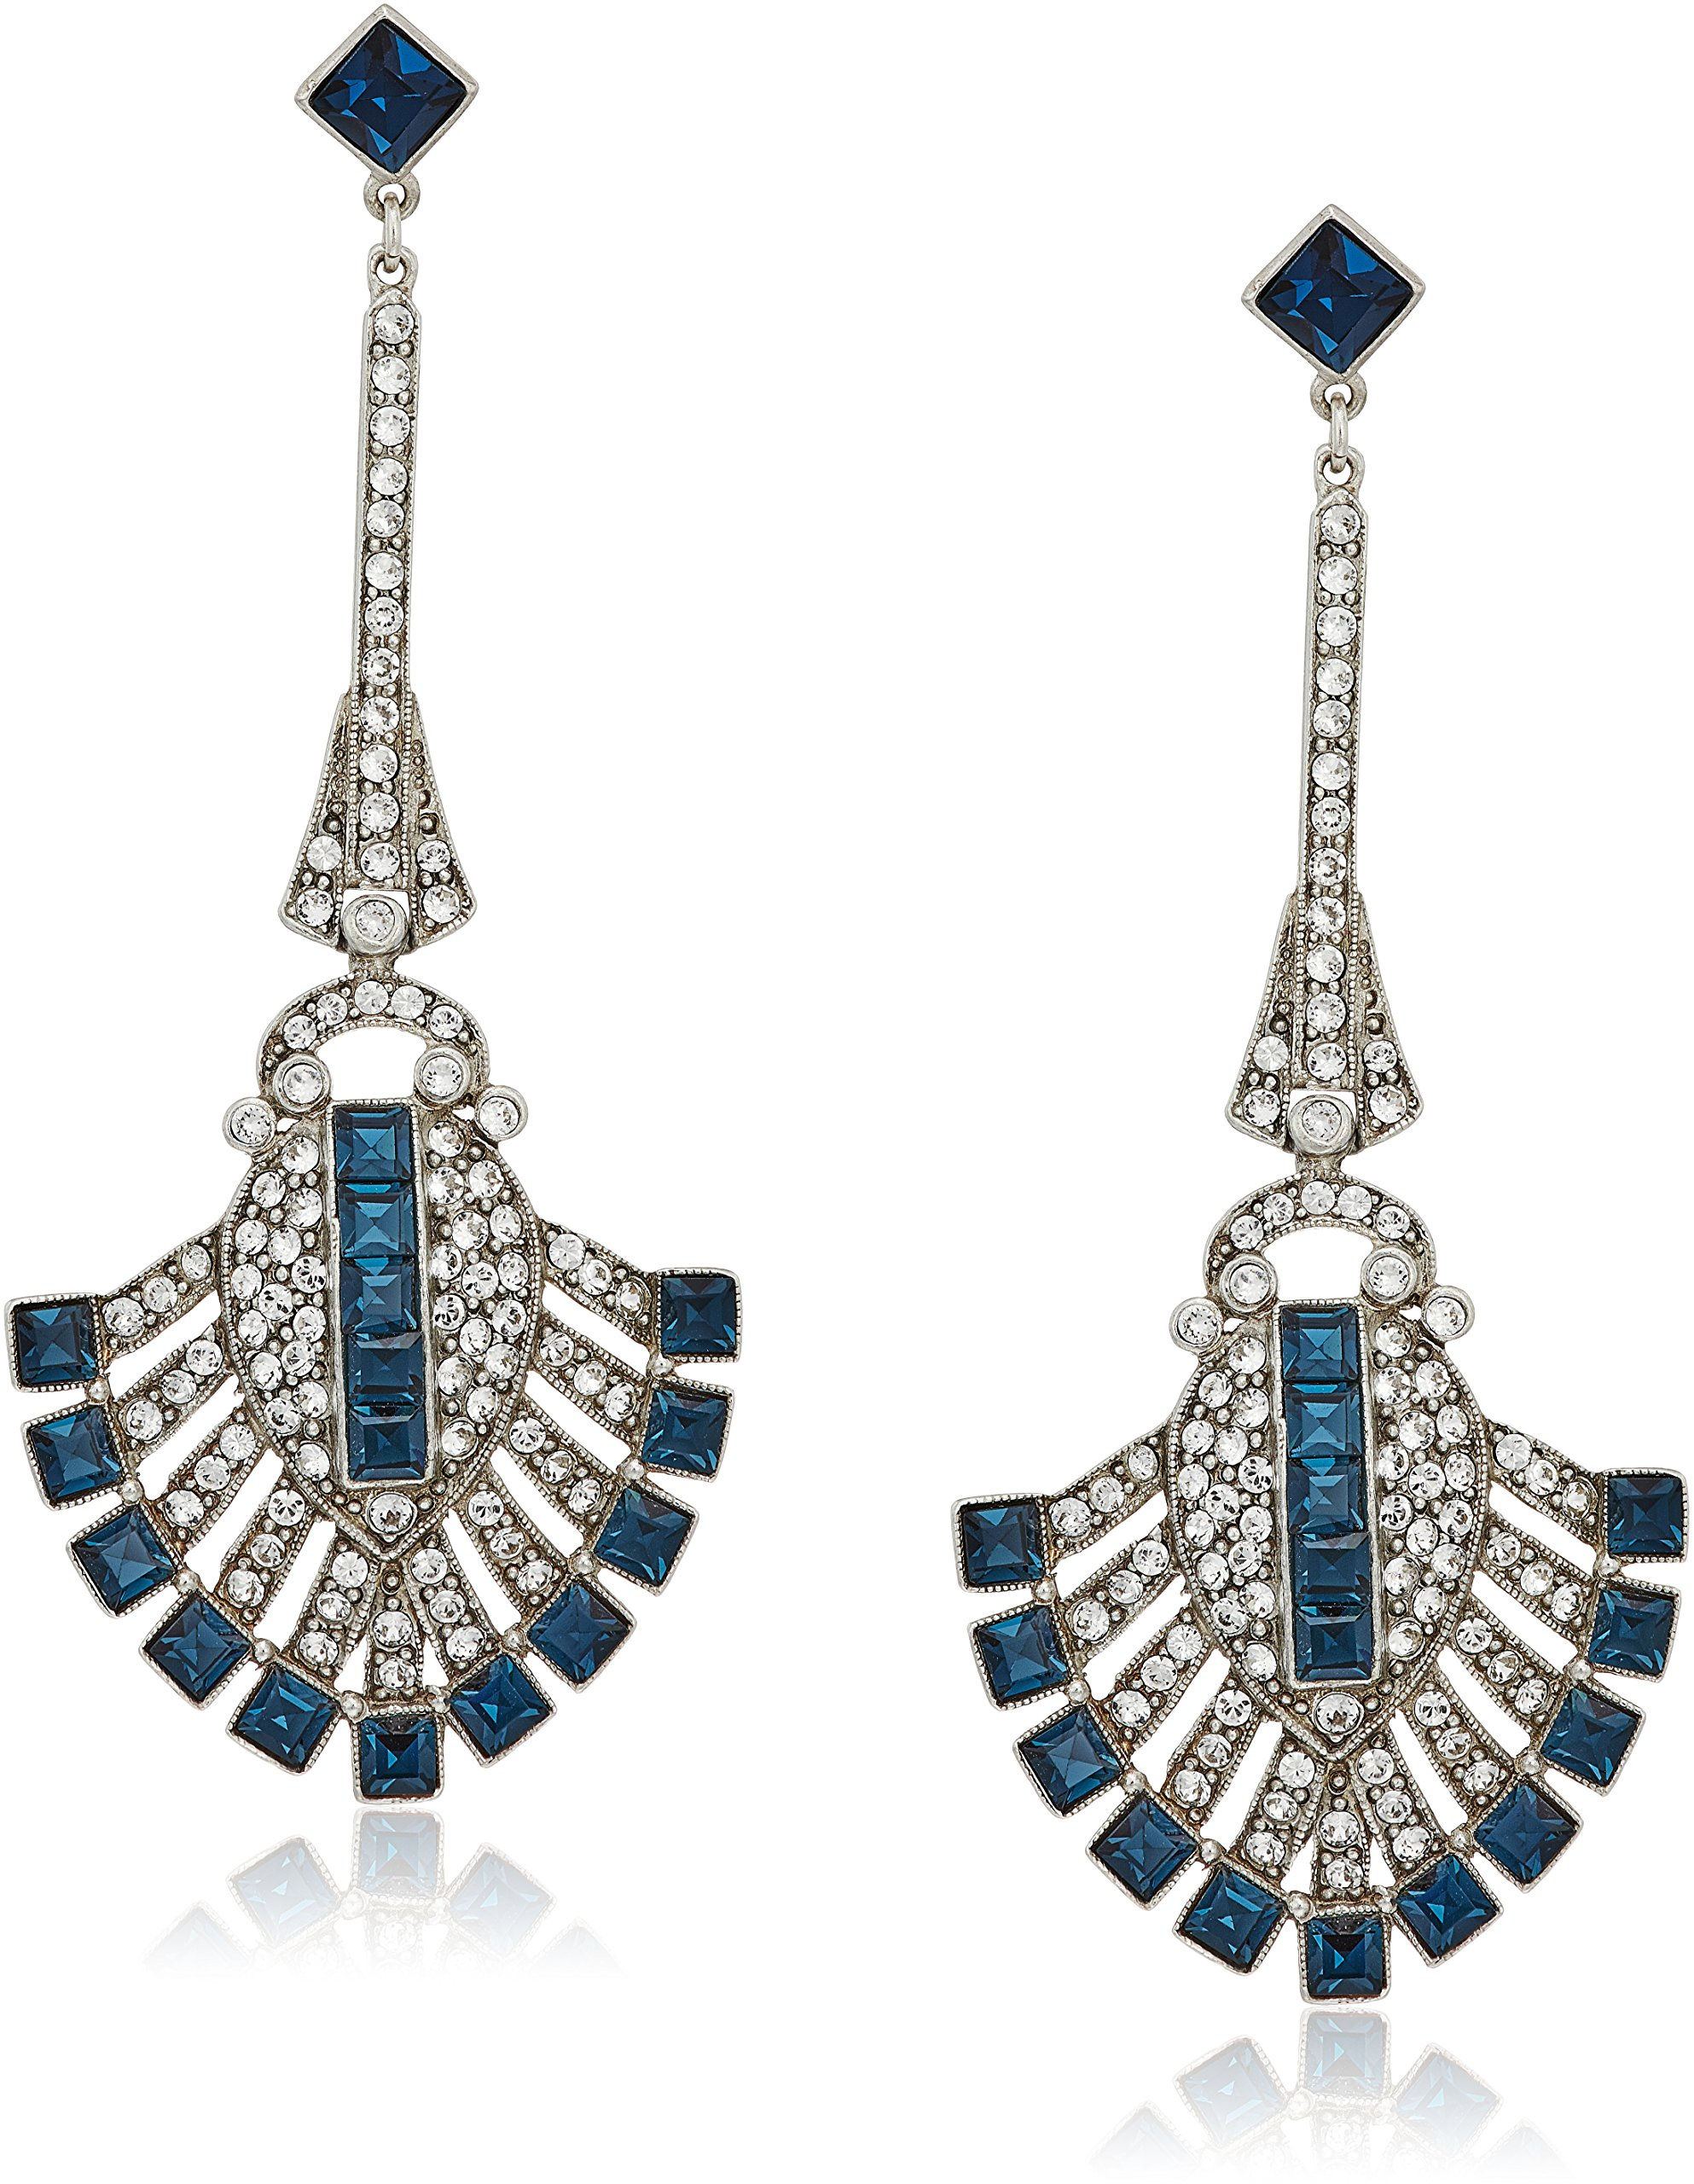 Ben-Amun Jewelry ''Deco'' Swarovski Crystal Sapphire Deco Fan For Bridal Wedding Anniversary Drop Earrings